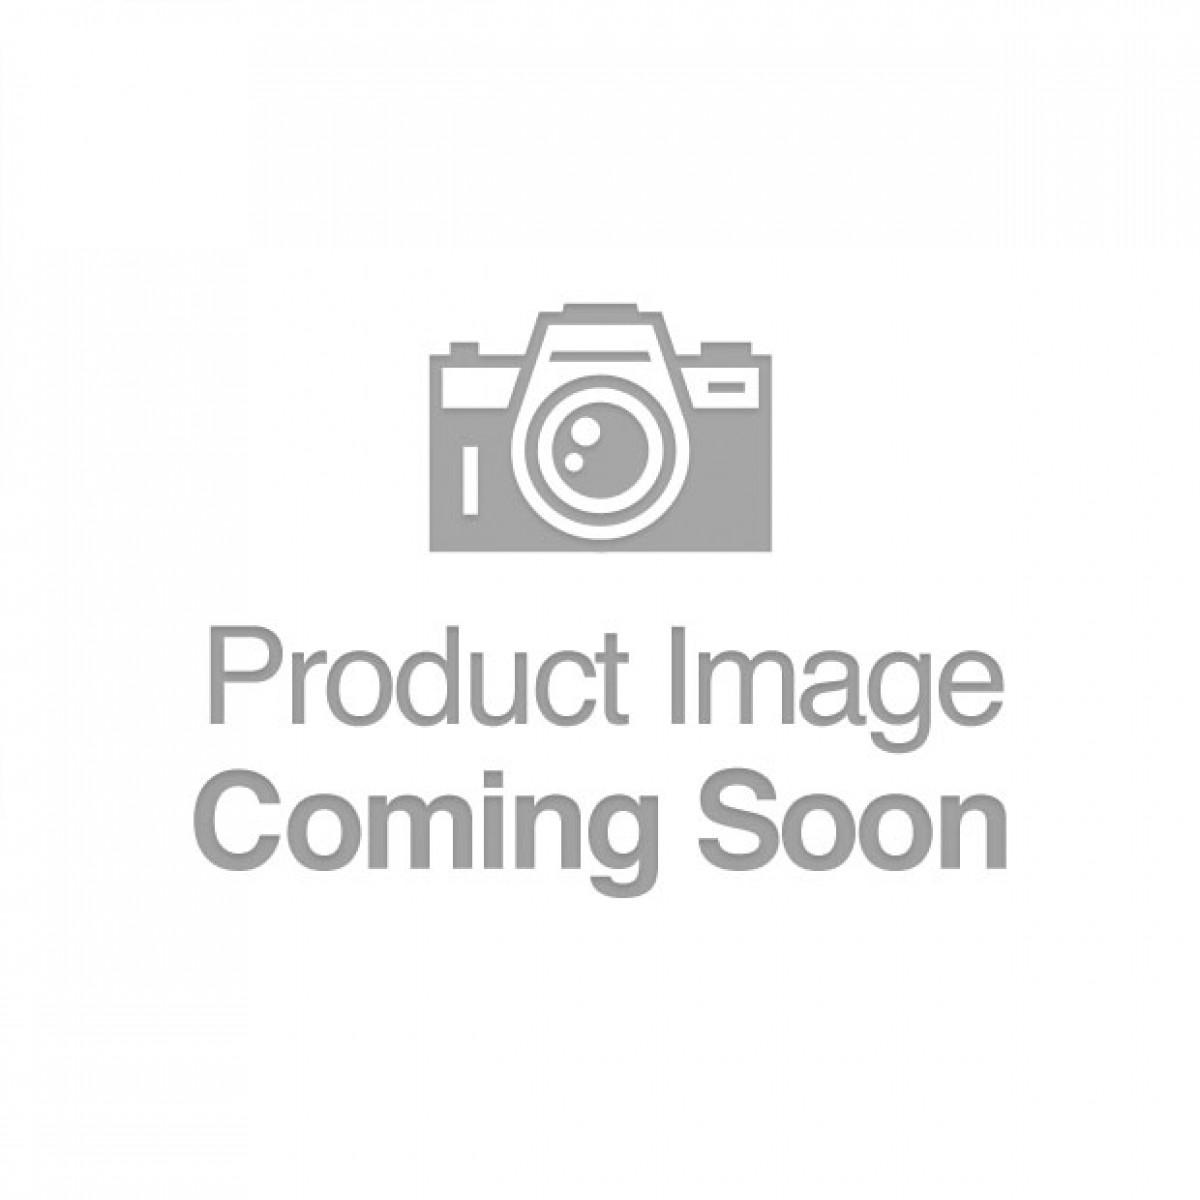 Blush Performance VX101 Male Enhancement Pump - Black